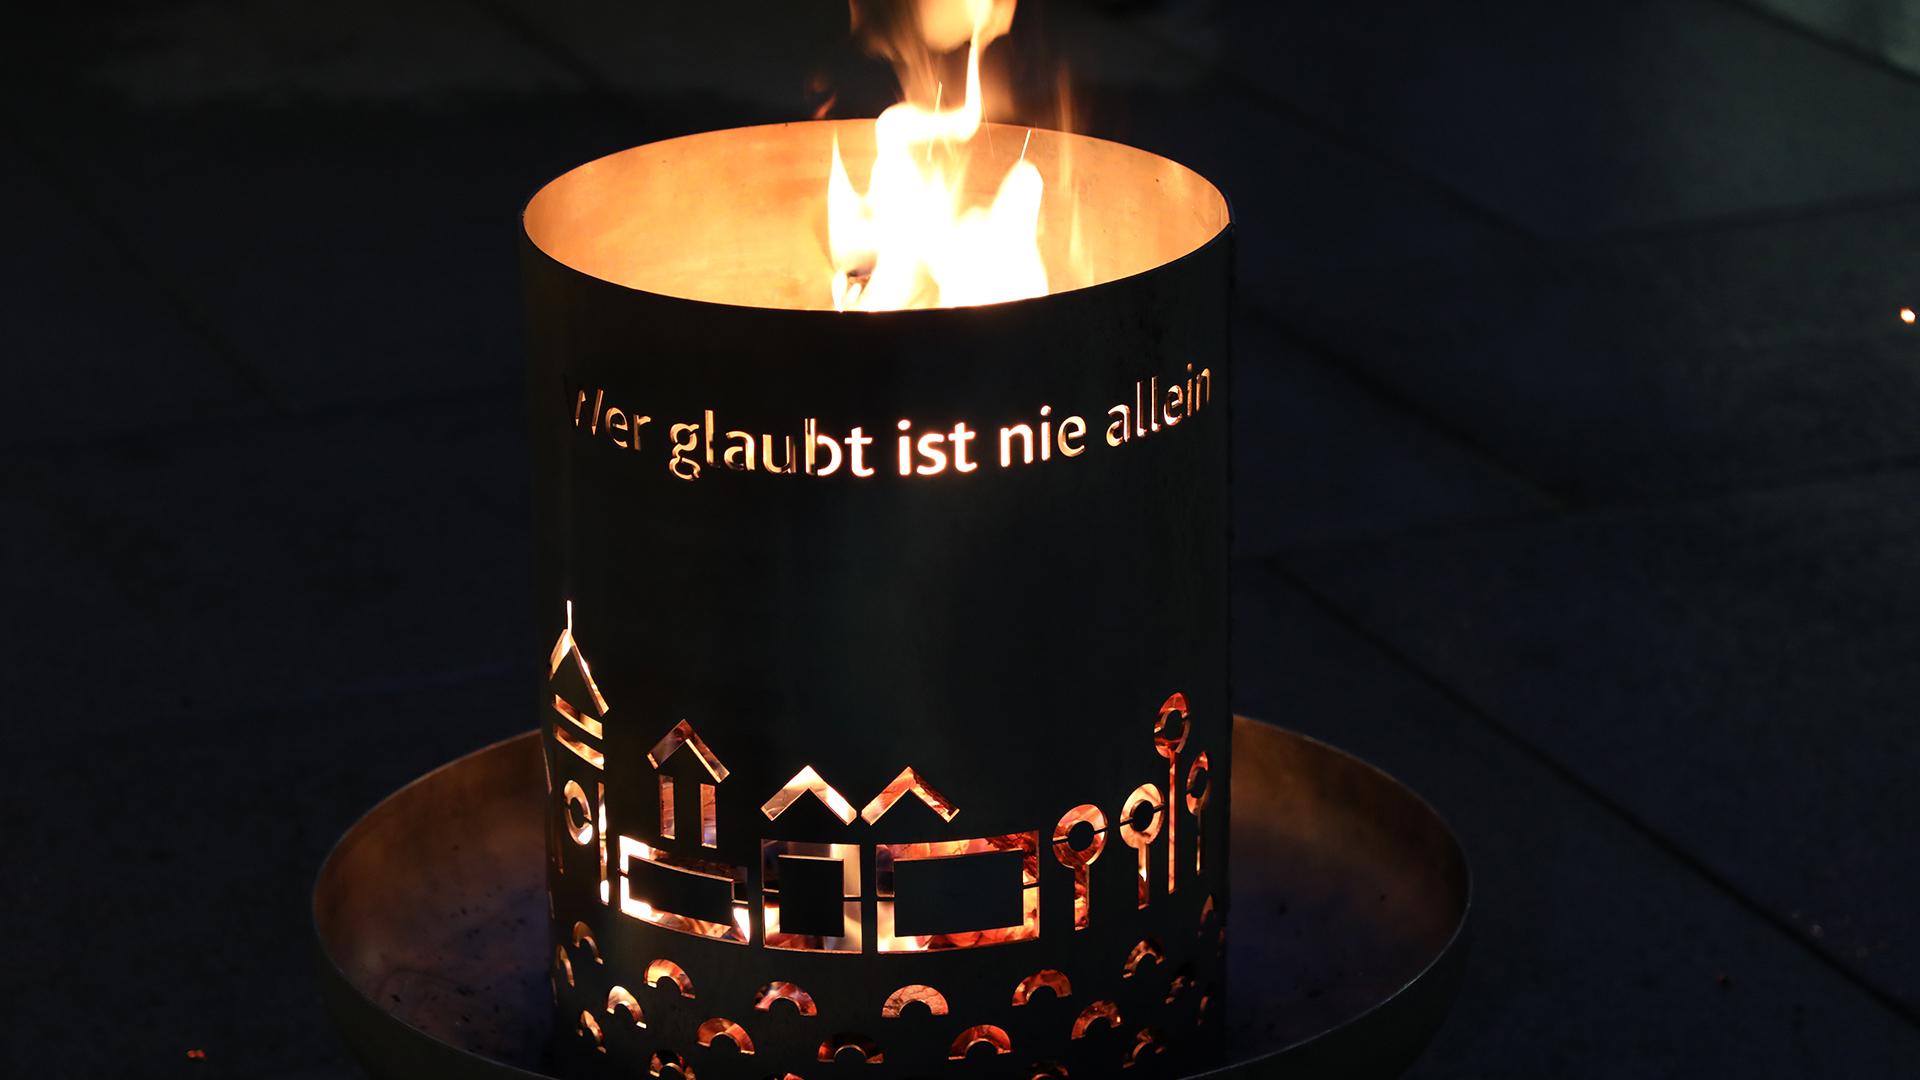 191210 Feuerschale Bistum Caritas title